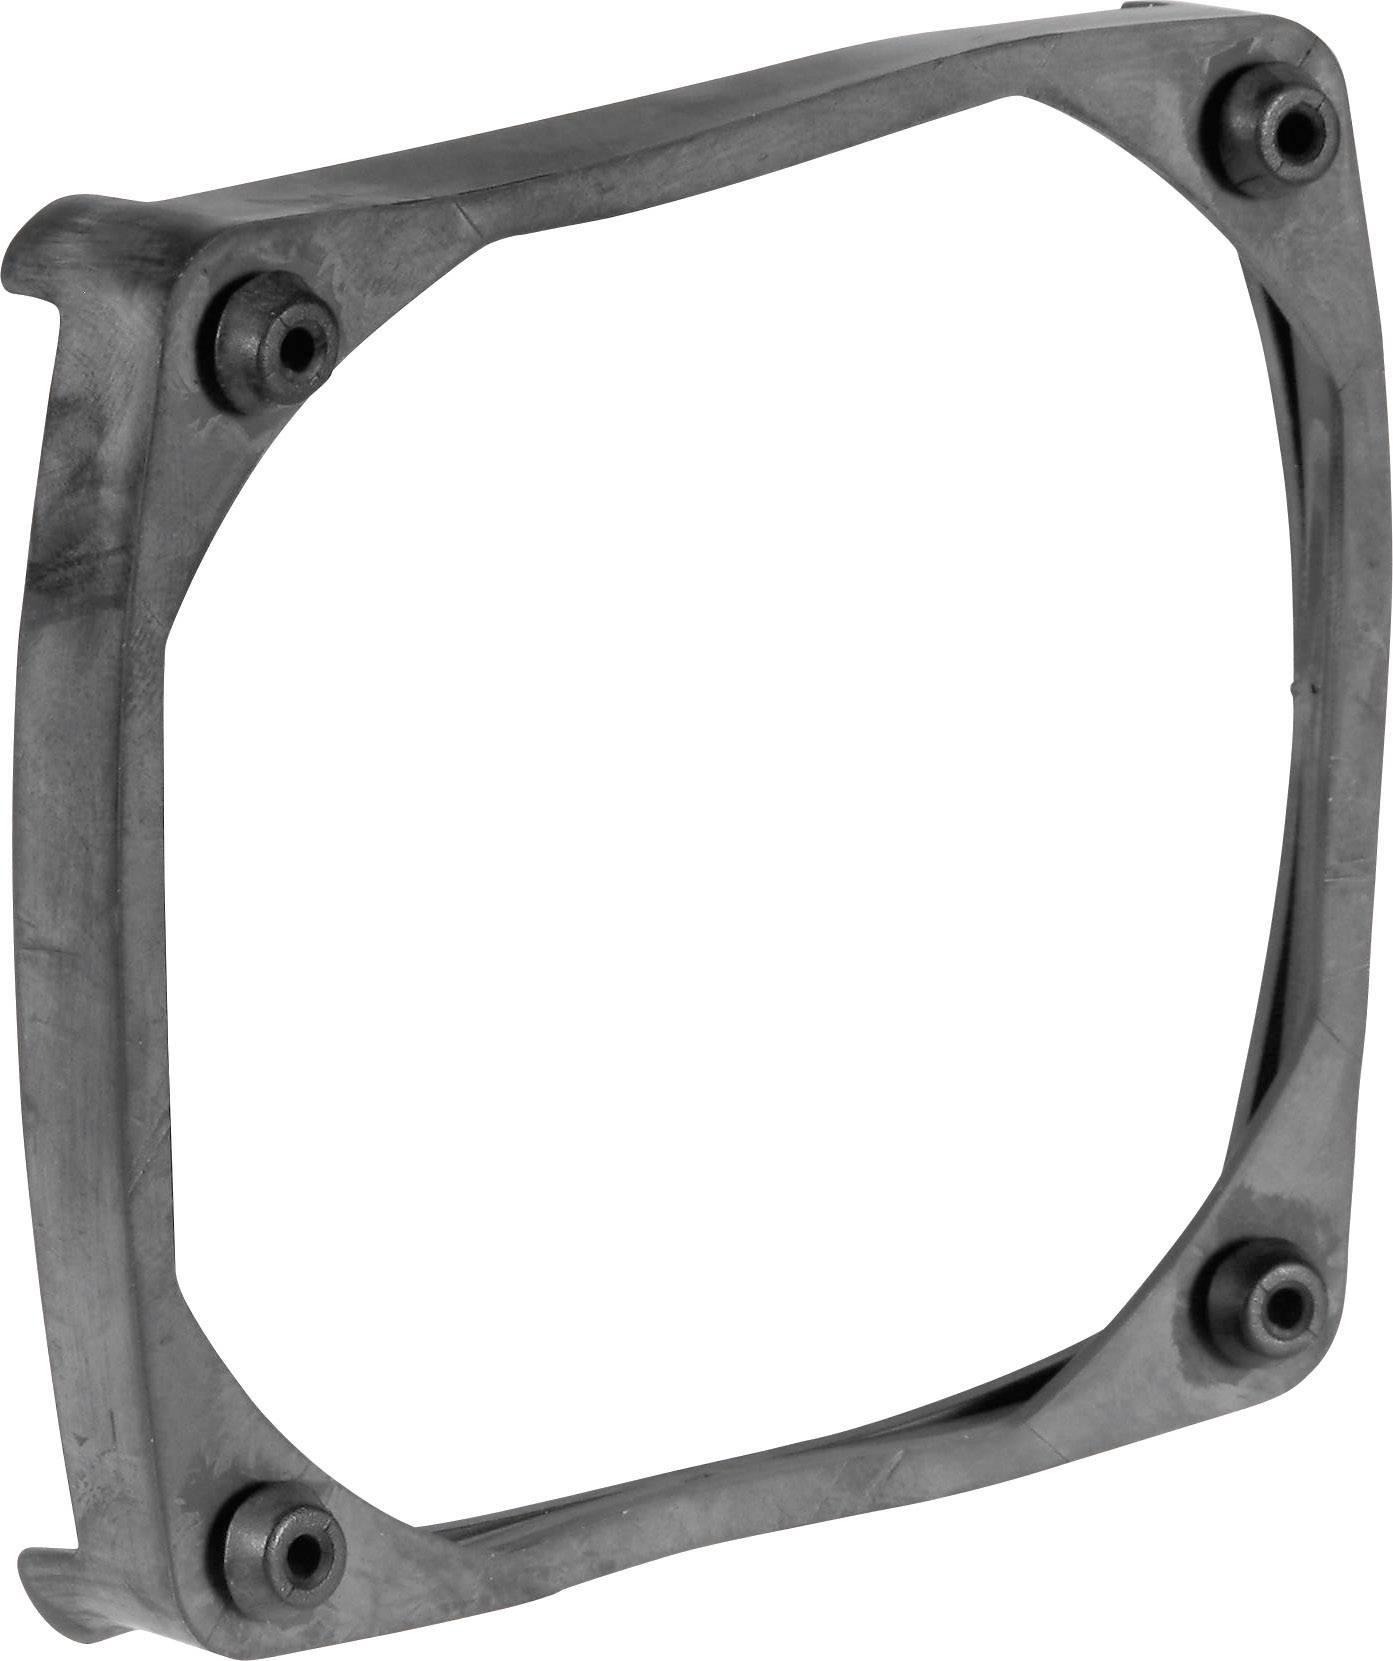 SEPA;954070210, (š x v x h) 43 x 43 x 5.25 mm, 1 ks, elastomér